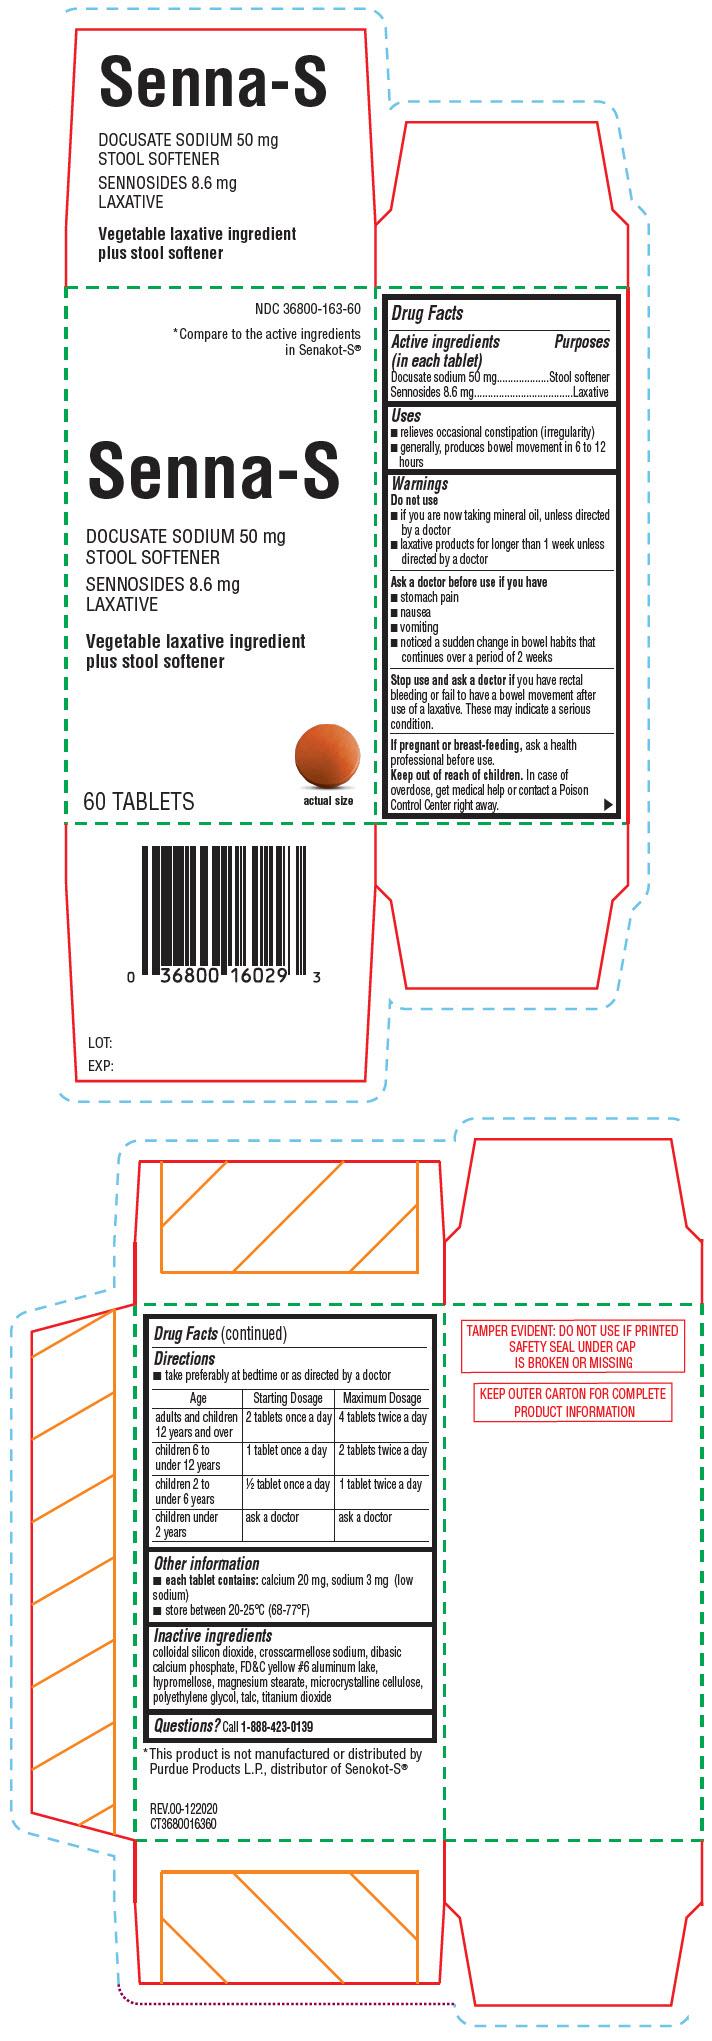 PRINCIPAL DISPLAY PANEL - 60 Tablet Bottle Carton